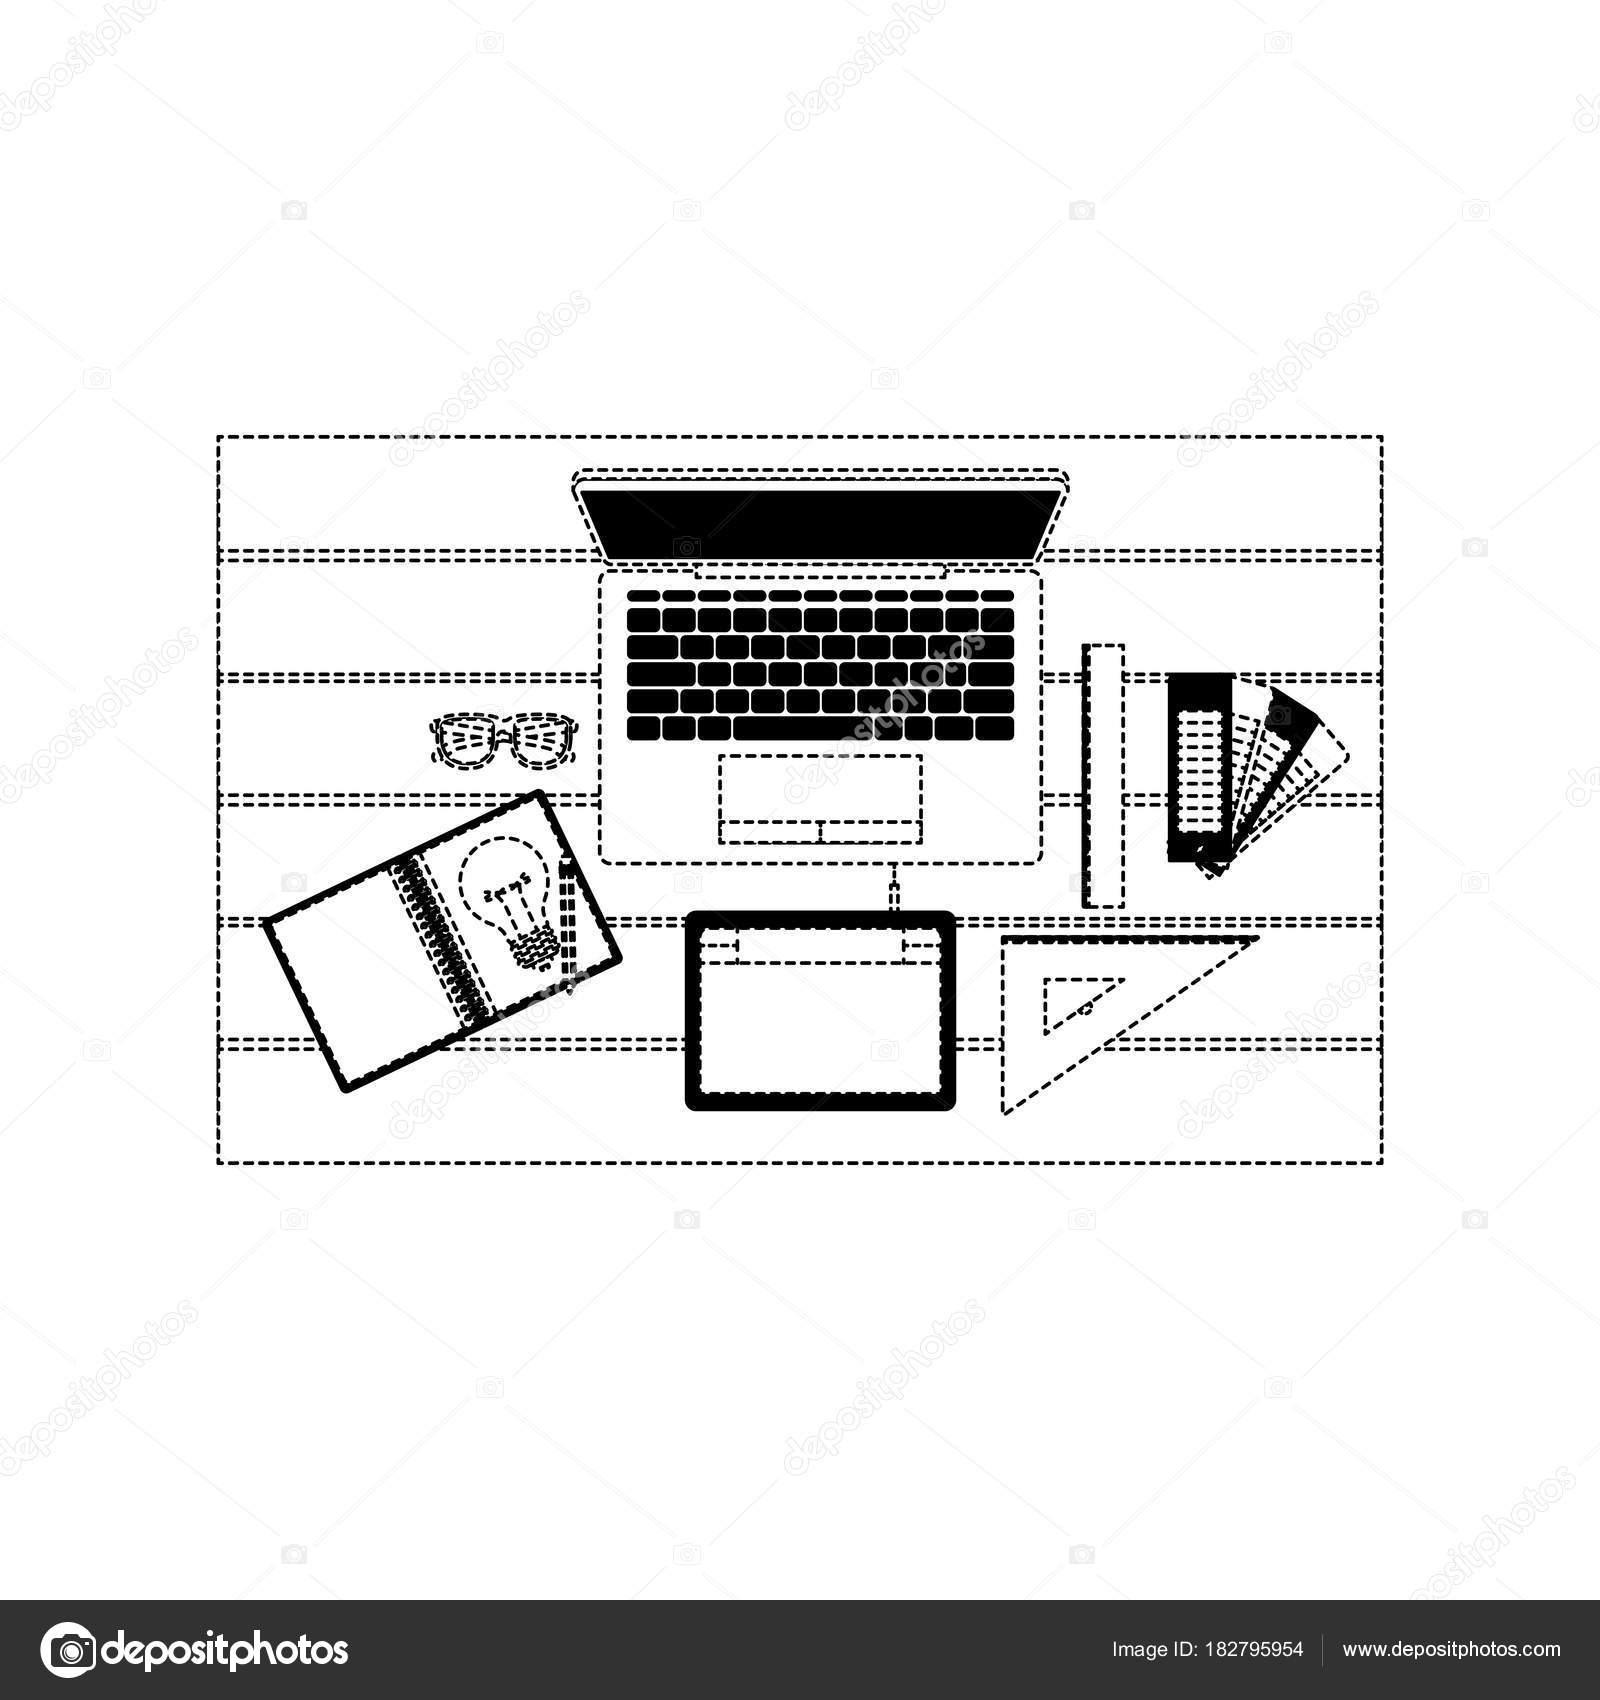 office drawing tools. laptop computer draw tool desk ruler tablet digitizer office school vector illustration \u2014 by grgroupstock drawing tools u